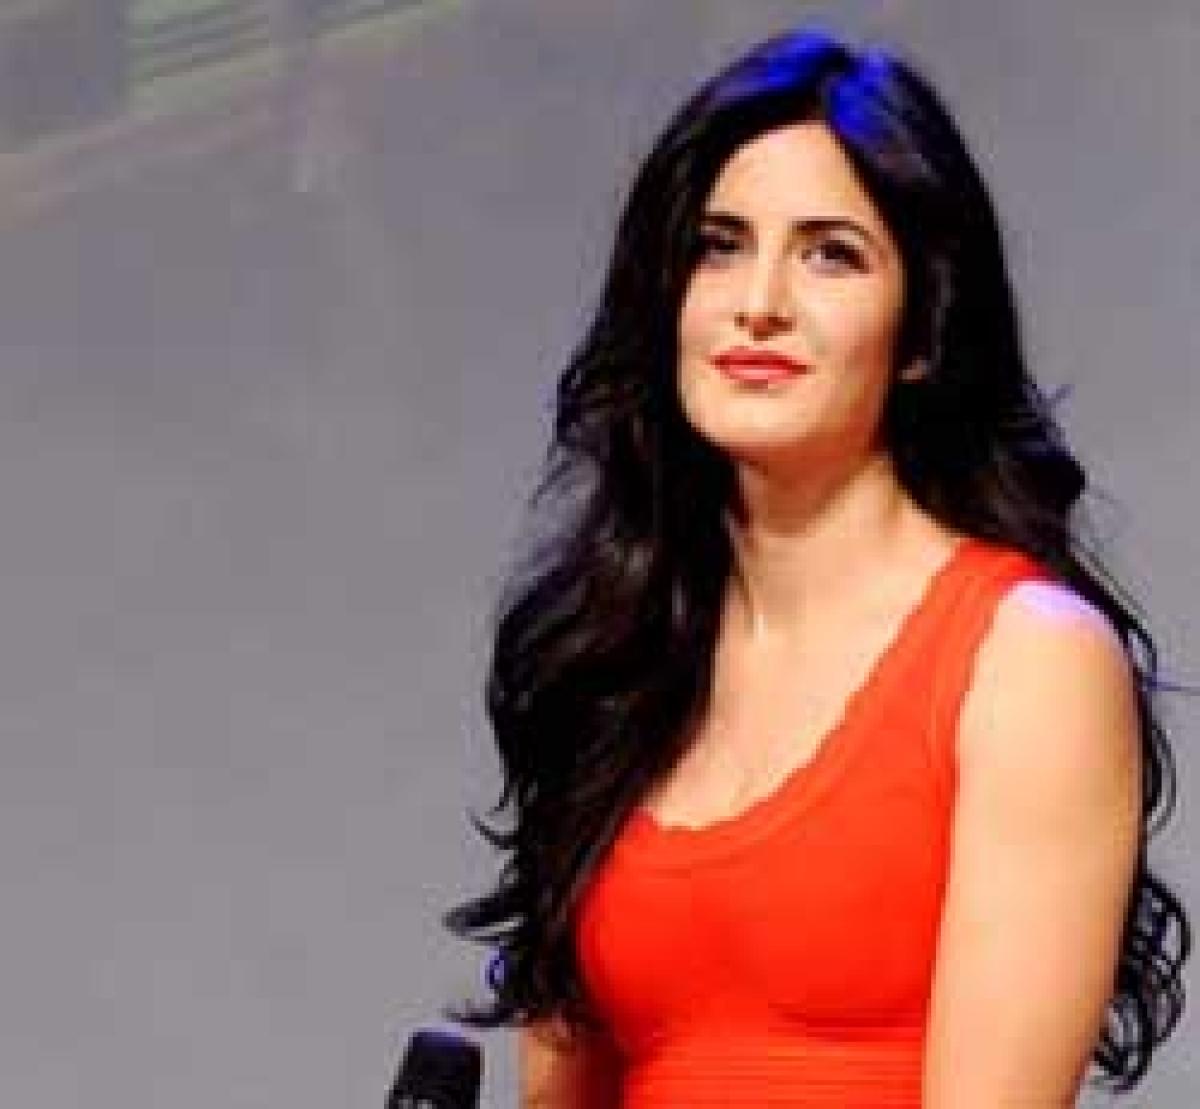 Will dance on 'Besharam' song at Ranbir's wedding: Katrina